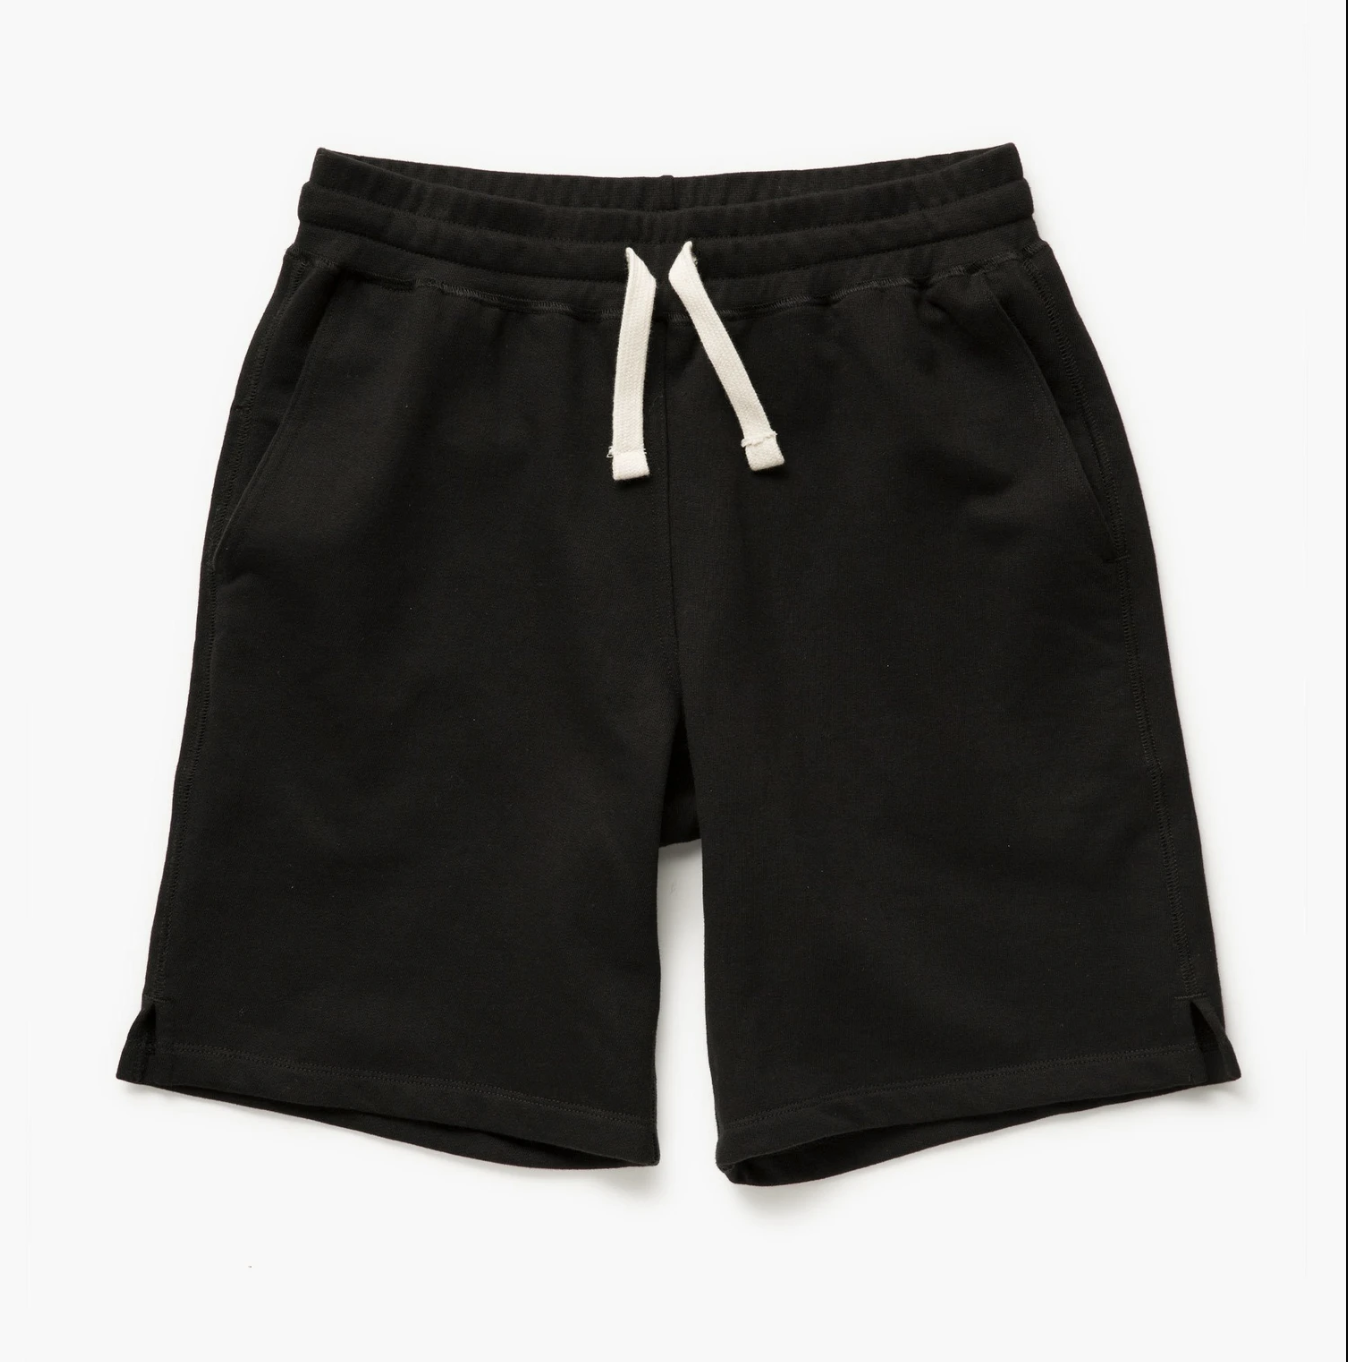 Details about  /SPORTFUL Performance Over Short BLACK 1101996-002 Men's Clothing Pants Short